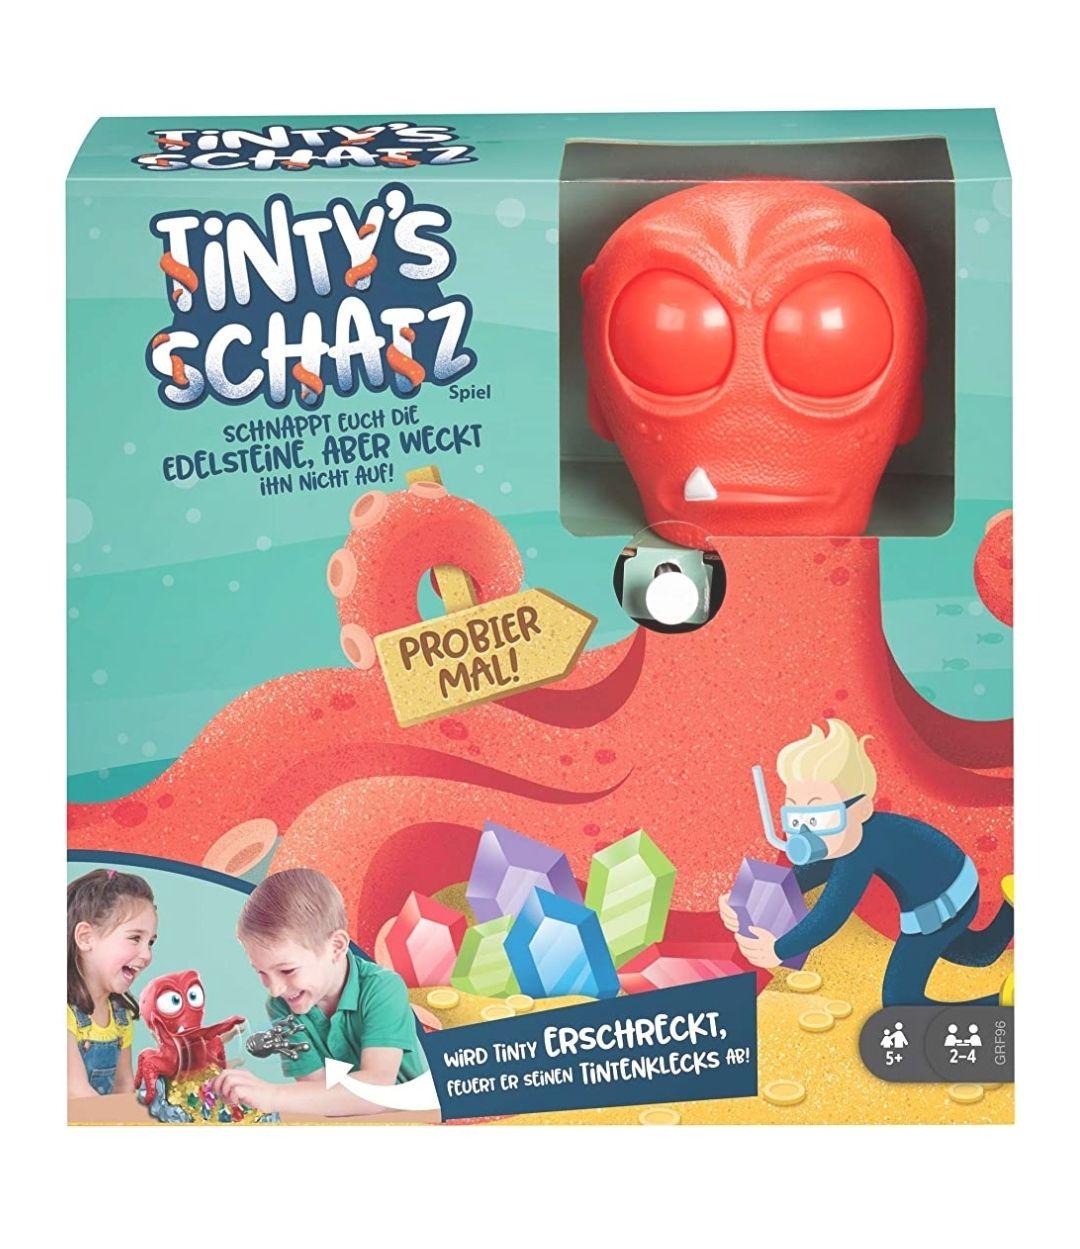 Amazon Prime- Tinty's Schatz Kinderspiel